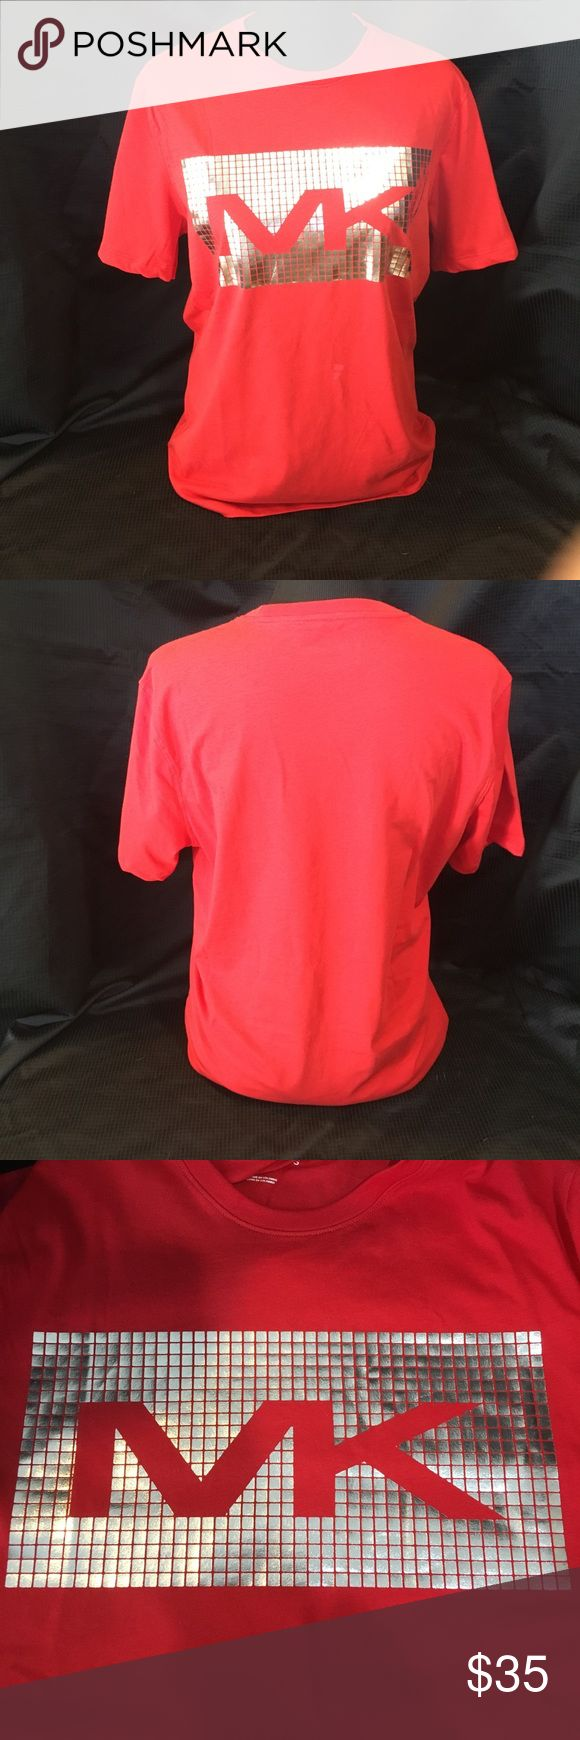 HP SPECIAL!! NWT Michael KORS Red & Silver T-Shirt Michael KORS red and silver t-shirt NWT. Available S, M, L, XL Michael Kors Shirts Tees - Short Sleeve